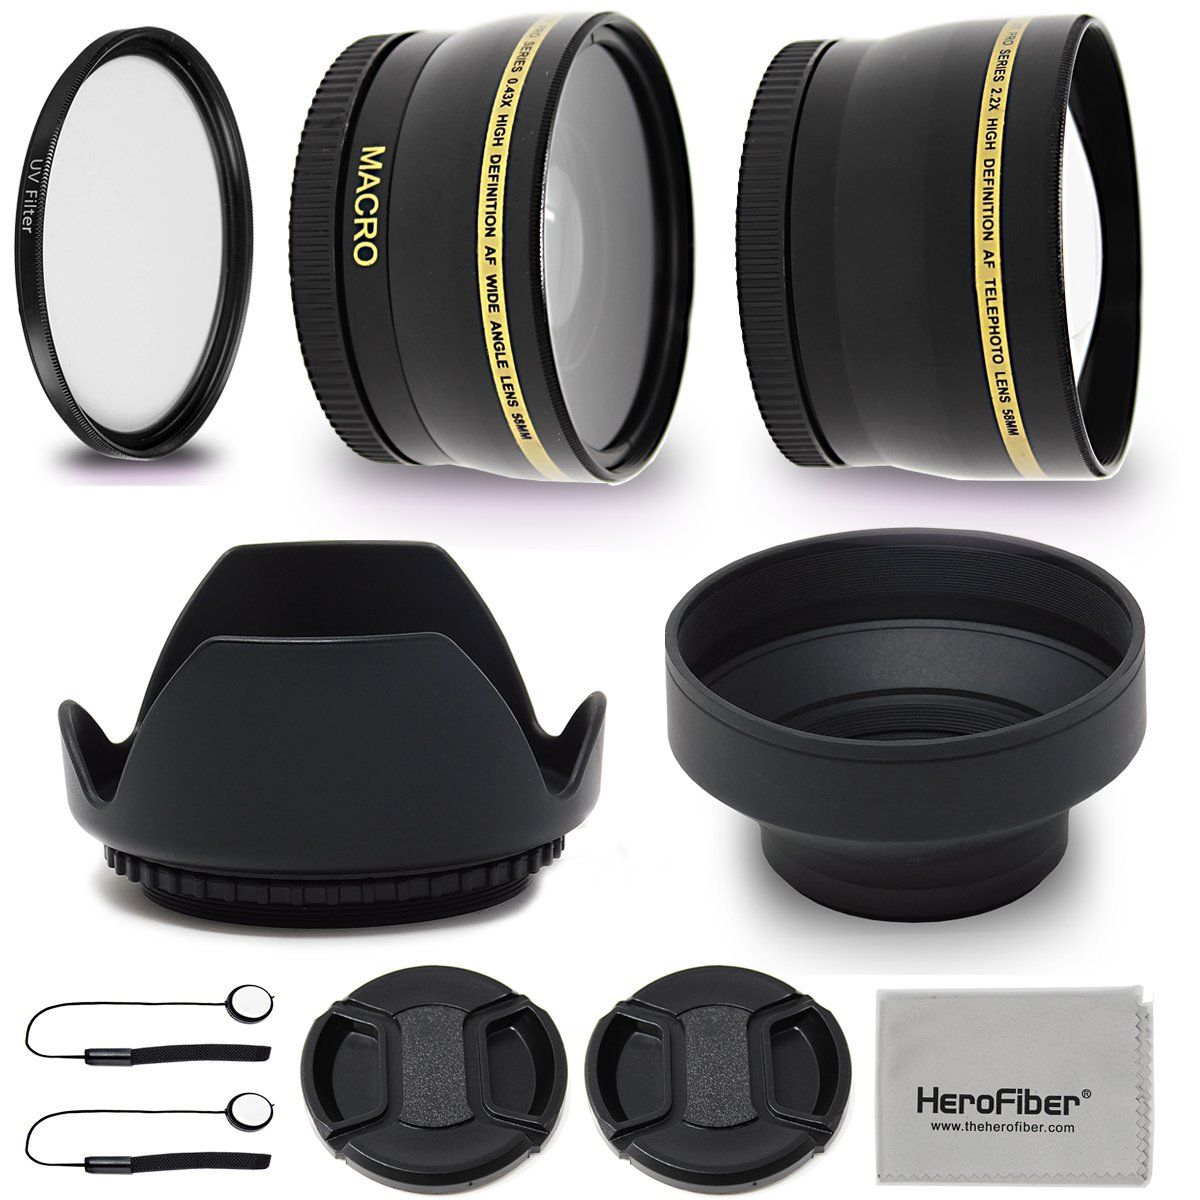 52mm Lens Accessories Kit with 52mm 2X Telephoto Lens Hood, 52mm Wide angle Lens, Lens Hood + more for For 52mm Lenses and Cameras including Nikon D5600, D850, D3400, D7500, D750, D500, D7200, D5500 by HeroFiber